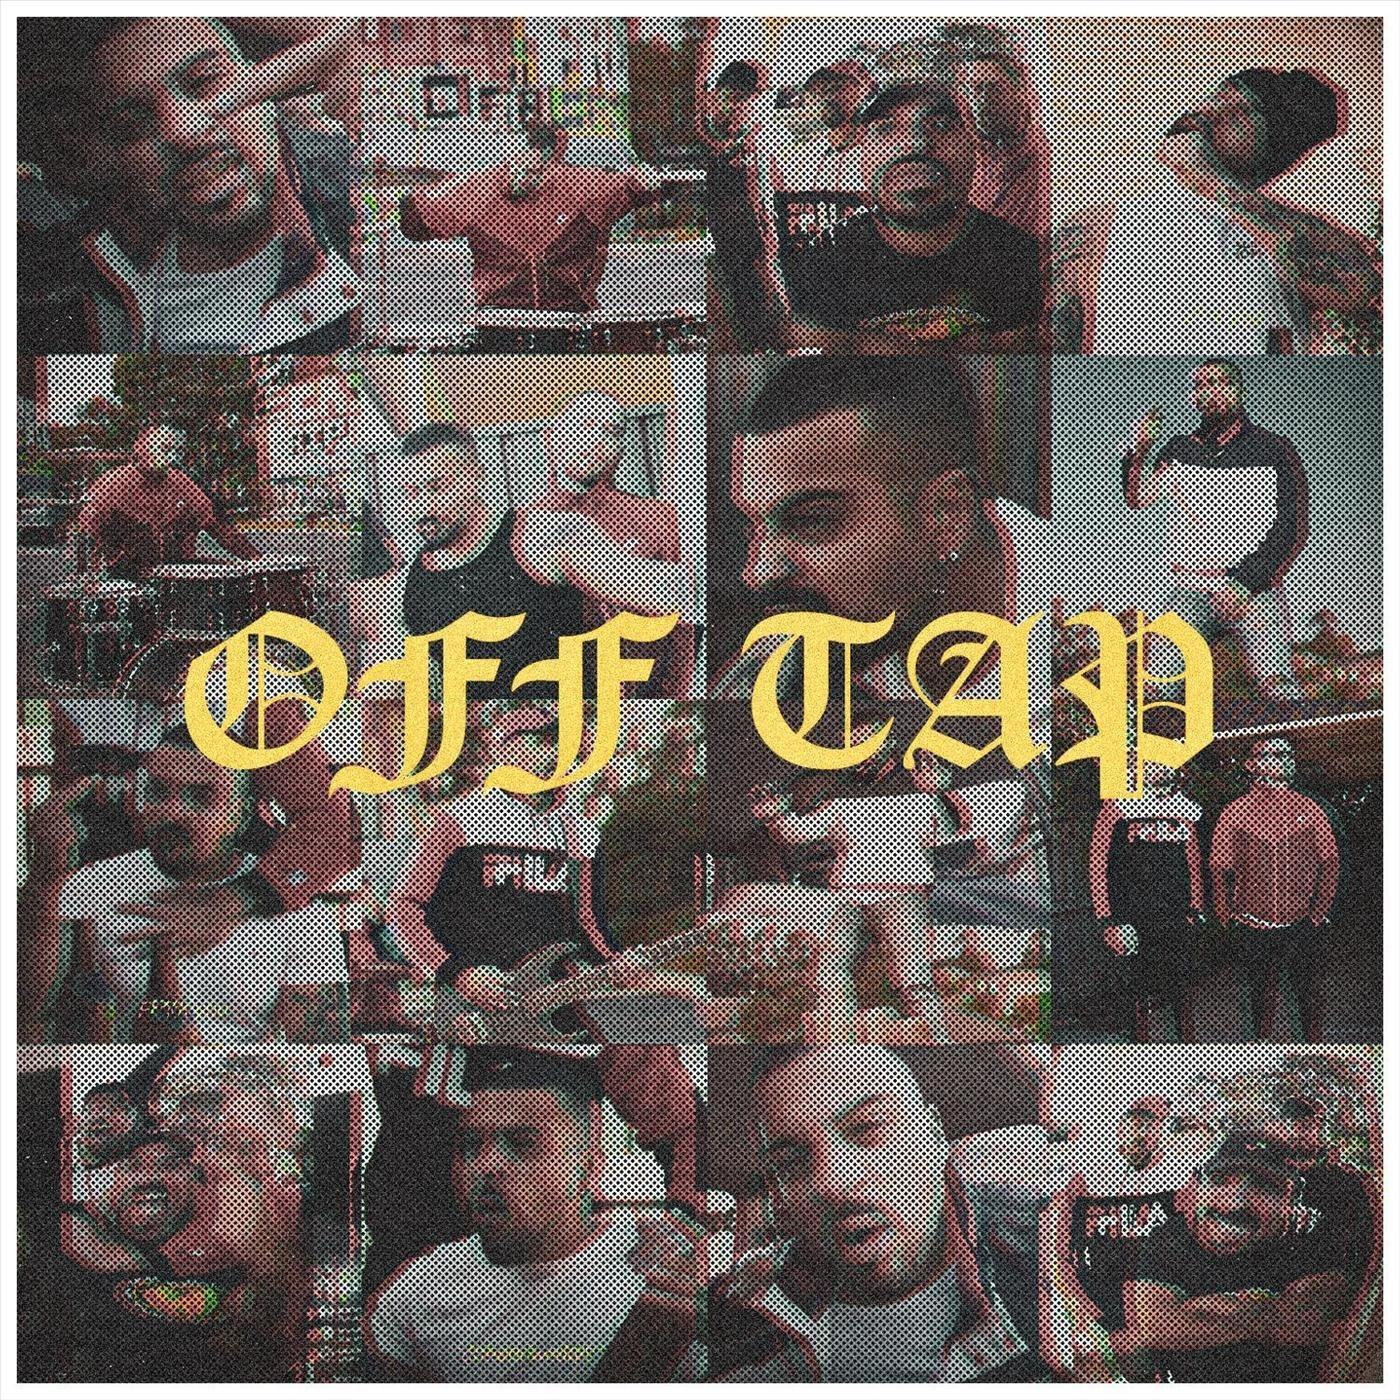 DVSR - Off Tap [single] (2020)